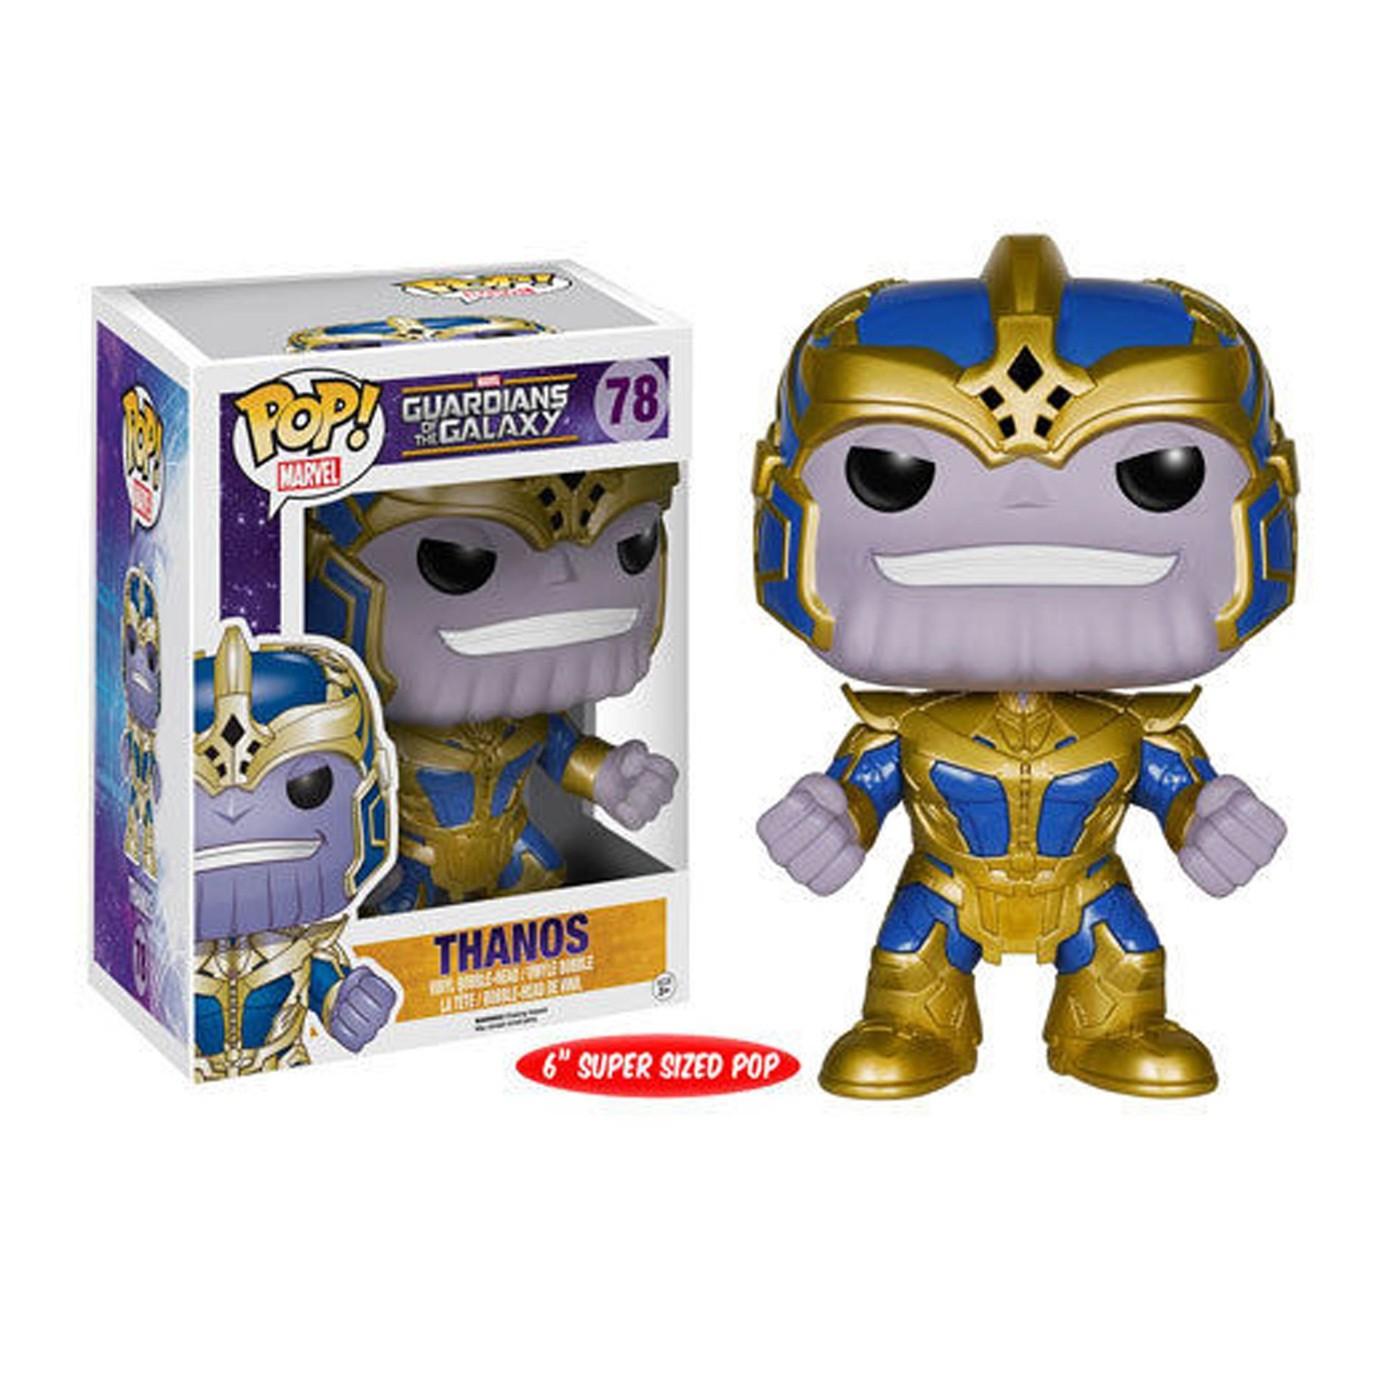 "GOTG Thanos 6"" Pop Vinyl Bobble Head"